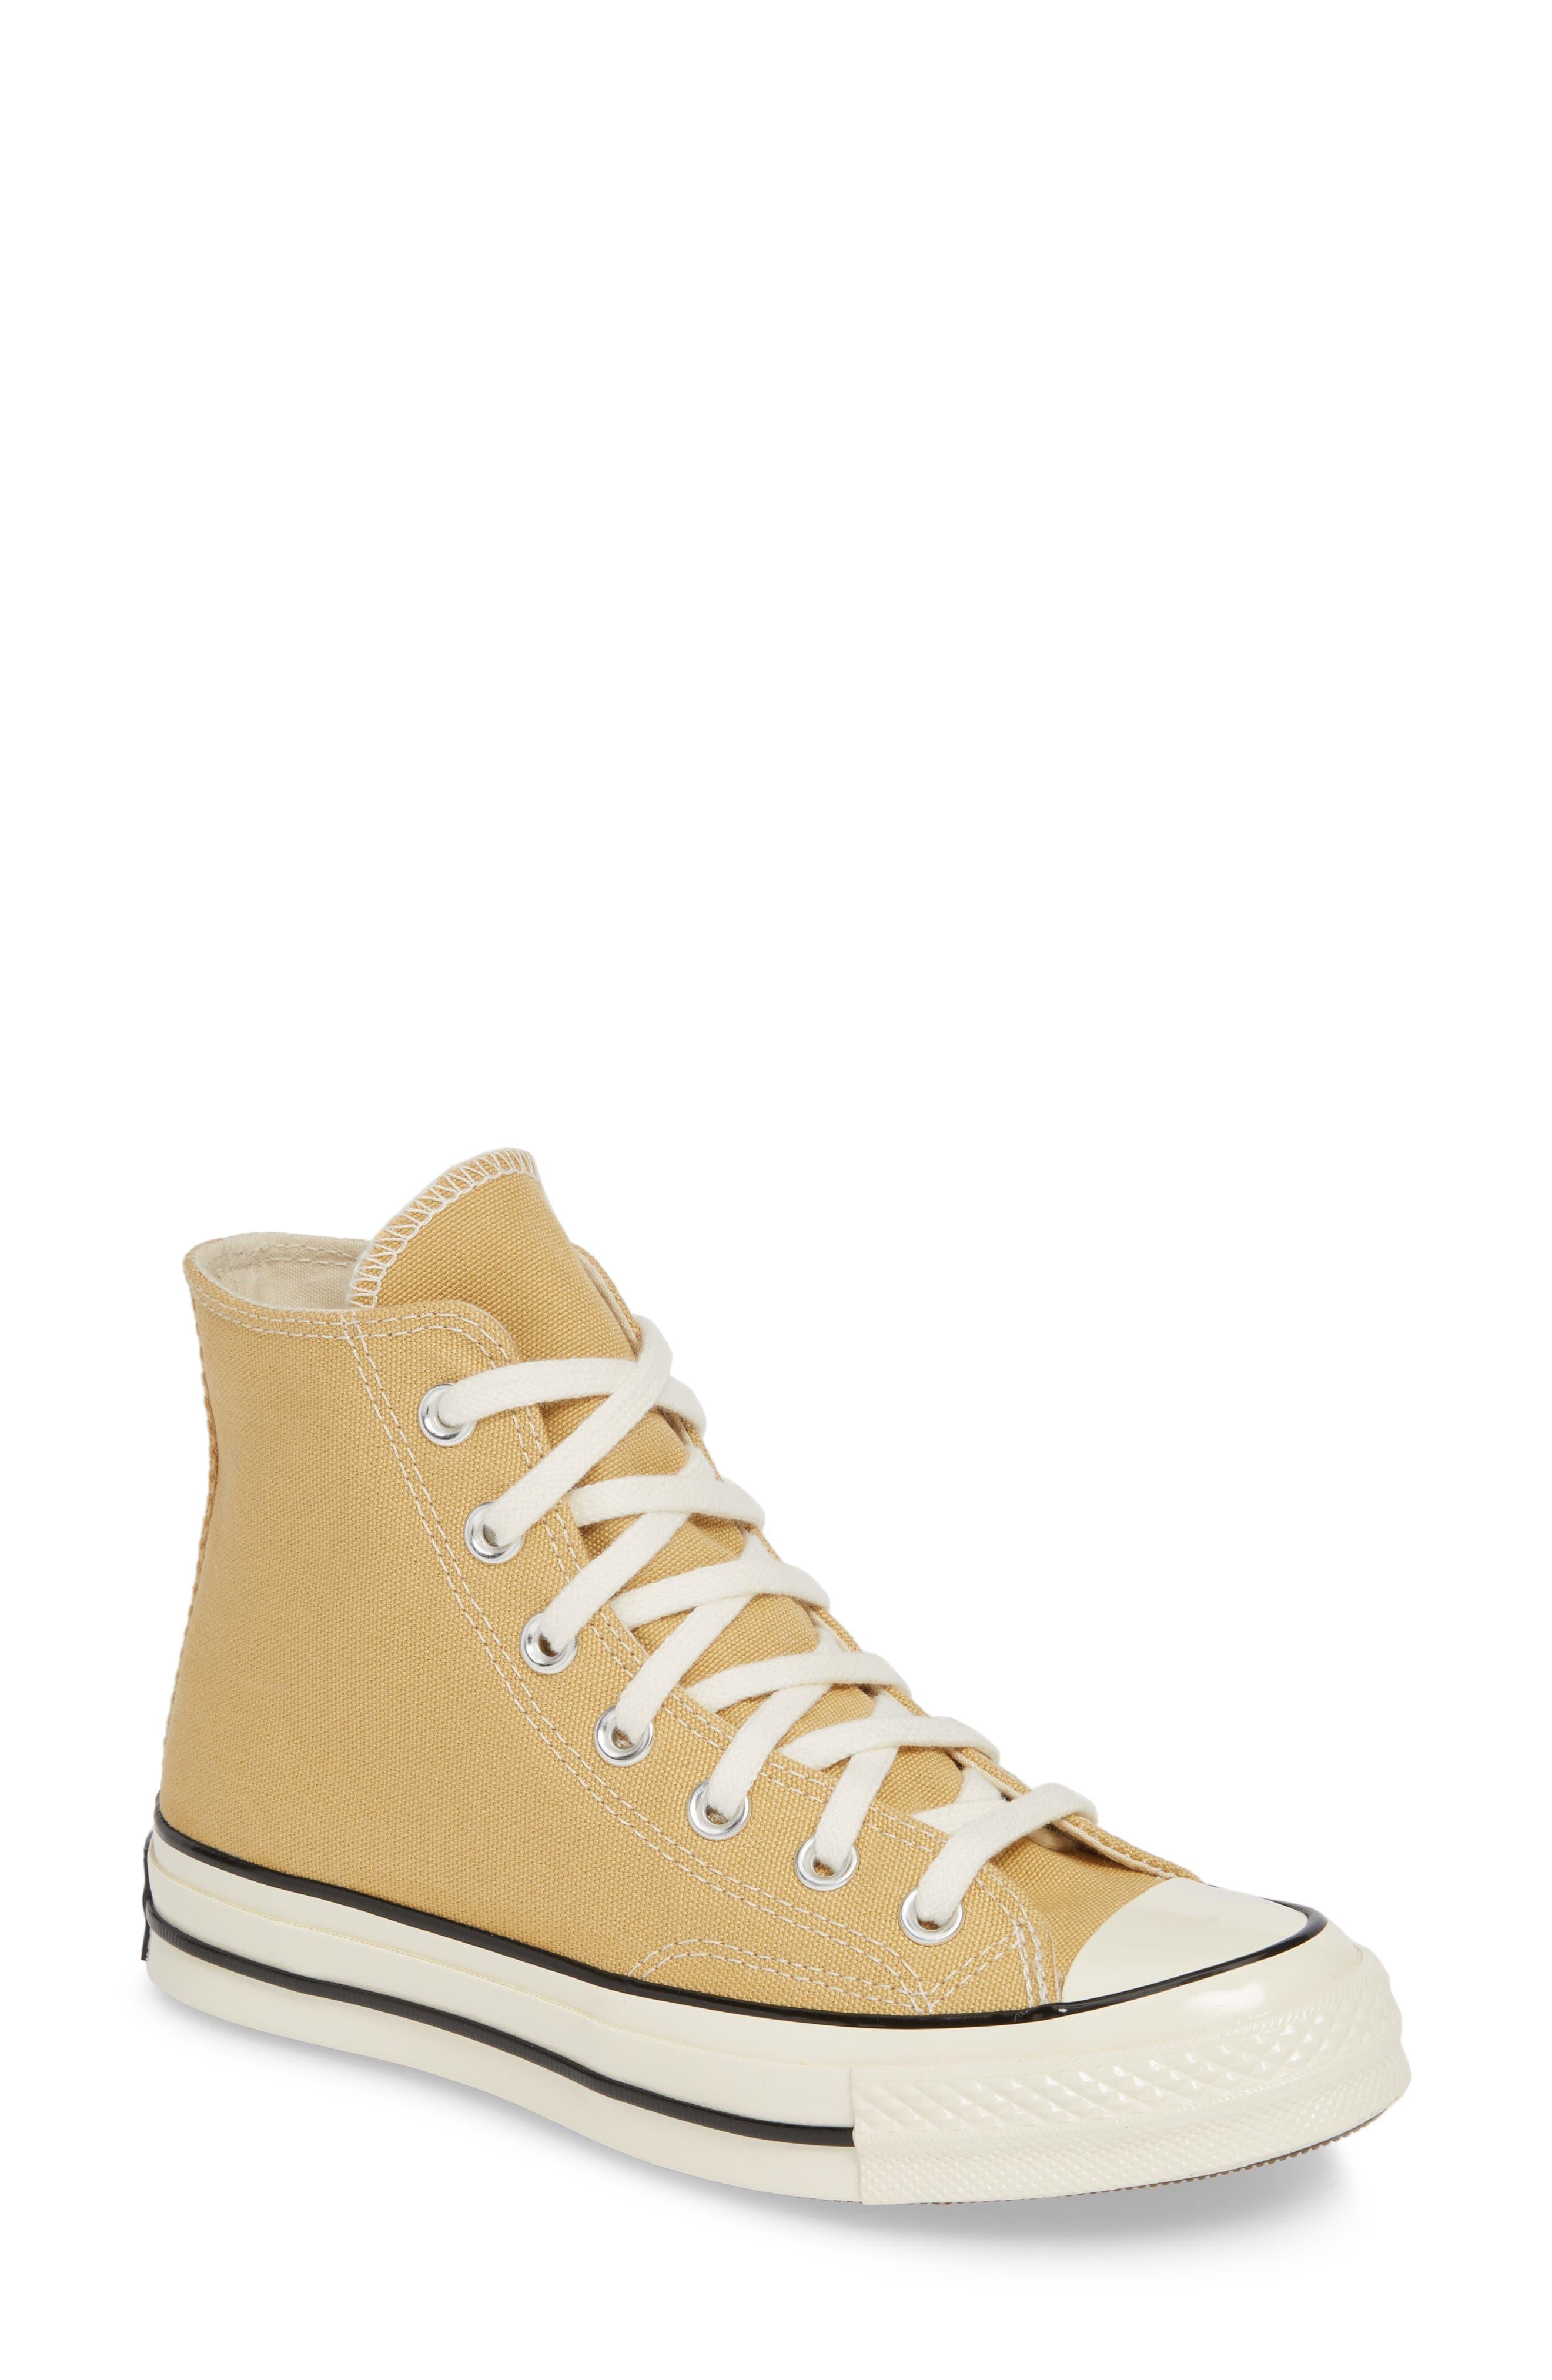 CONVERSE, Chuck Taylor<sup>®</sup> All Star<sup>®</sup> 70 High Top Sneaker, Main thumbnail 1, color, CLUB GOLD/ EGRET/ BLACK